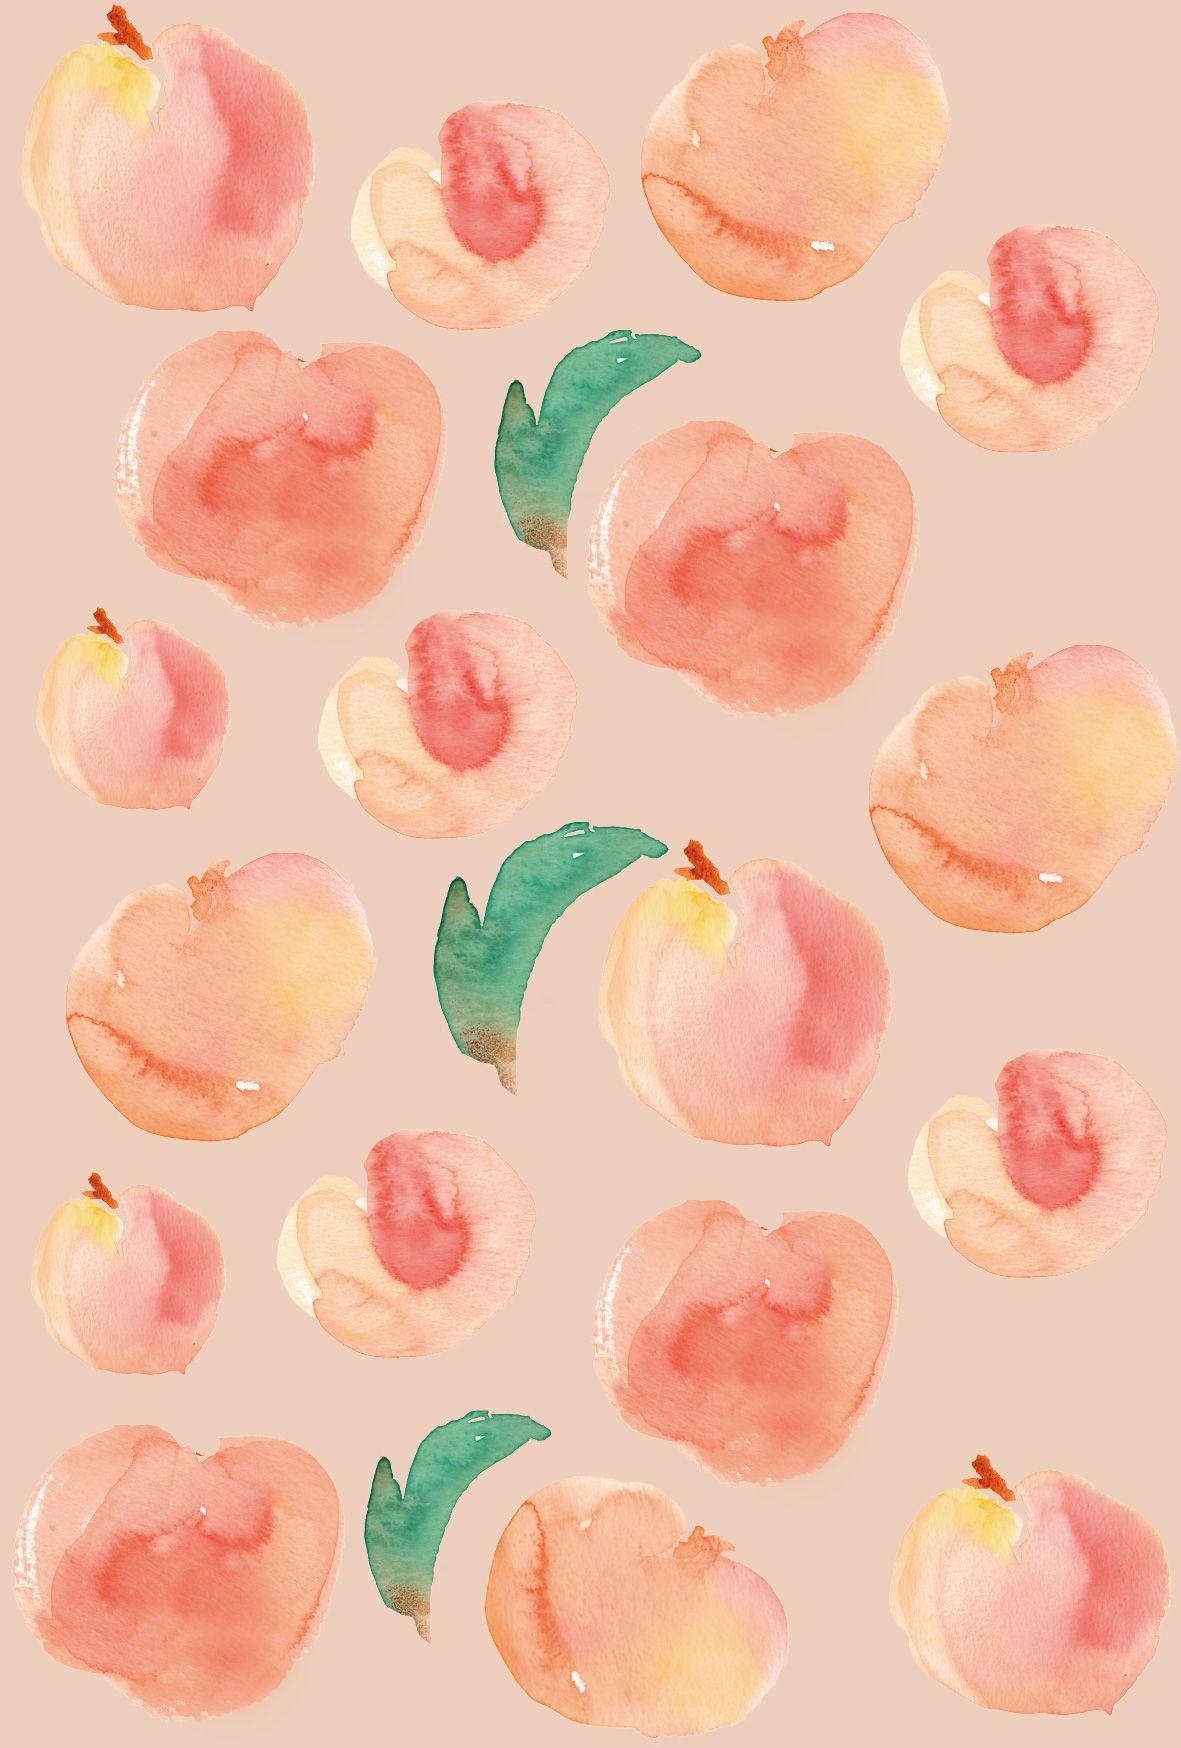 Kawaii Peach Wallpapers Top Free Kawaii Peach Backgrounds Wallpaperaccess